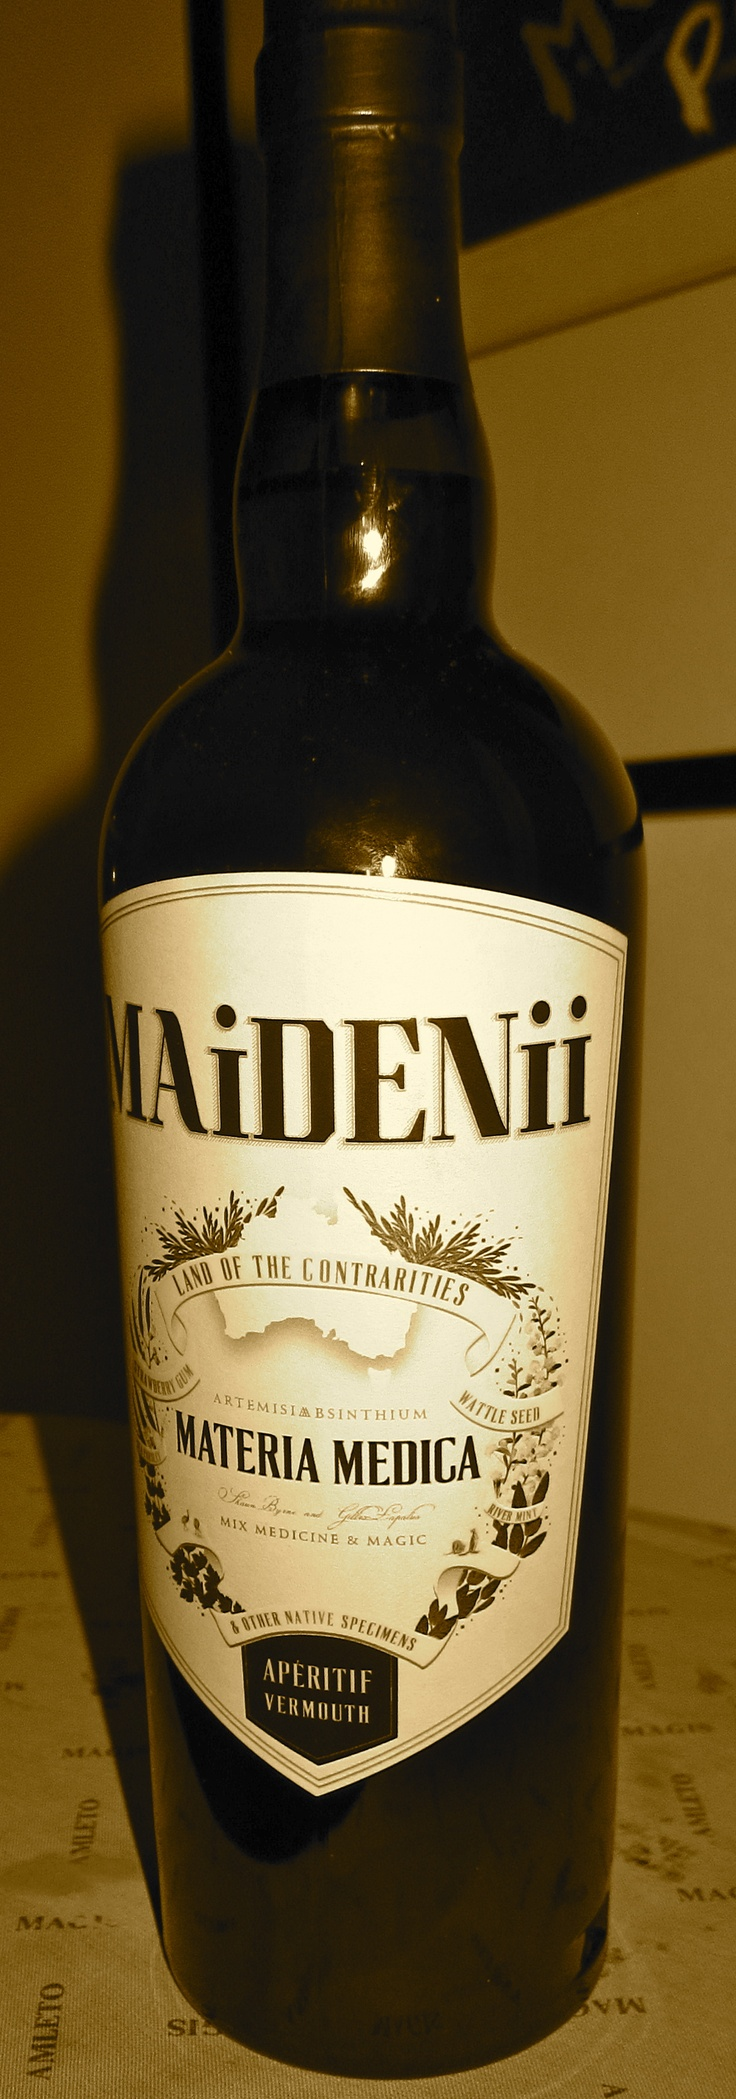 the Aussie vermouth - MAiDENii MATERIA MEDICA. Loving this delightful drop.